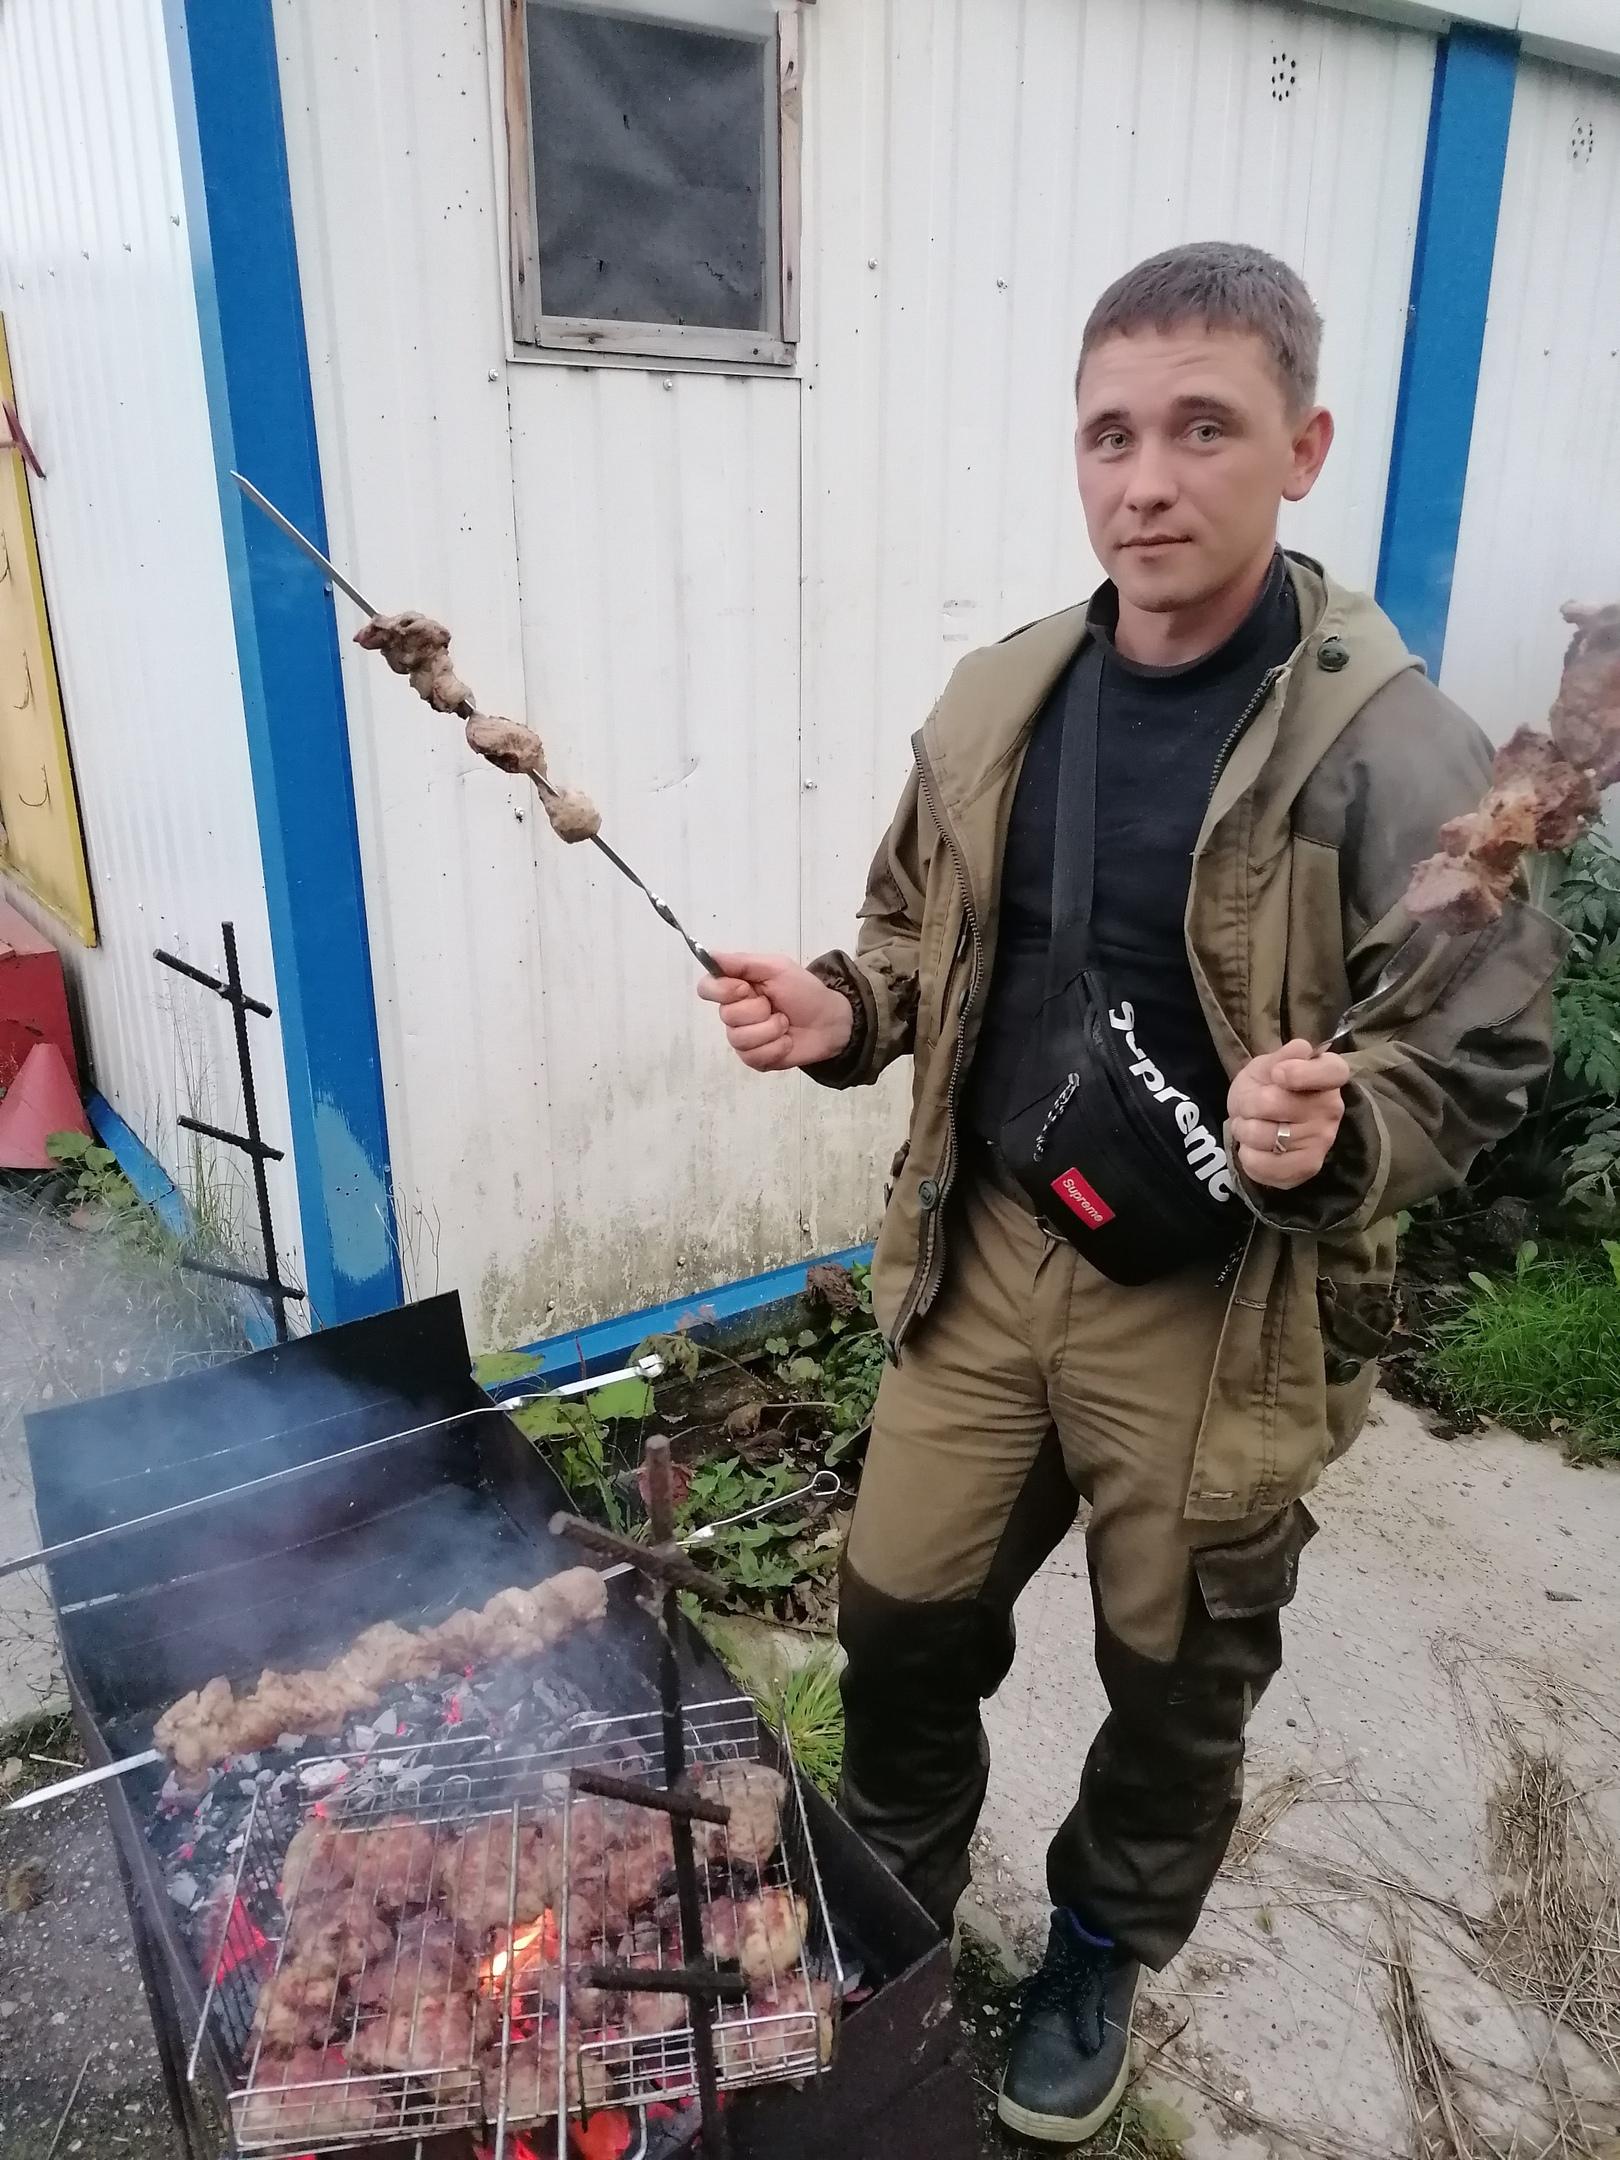 Дмитрий, 30, Майкоп, Адыгея, Россия